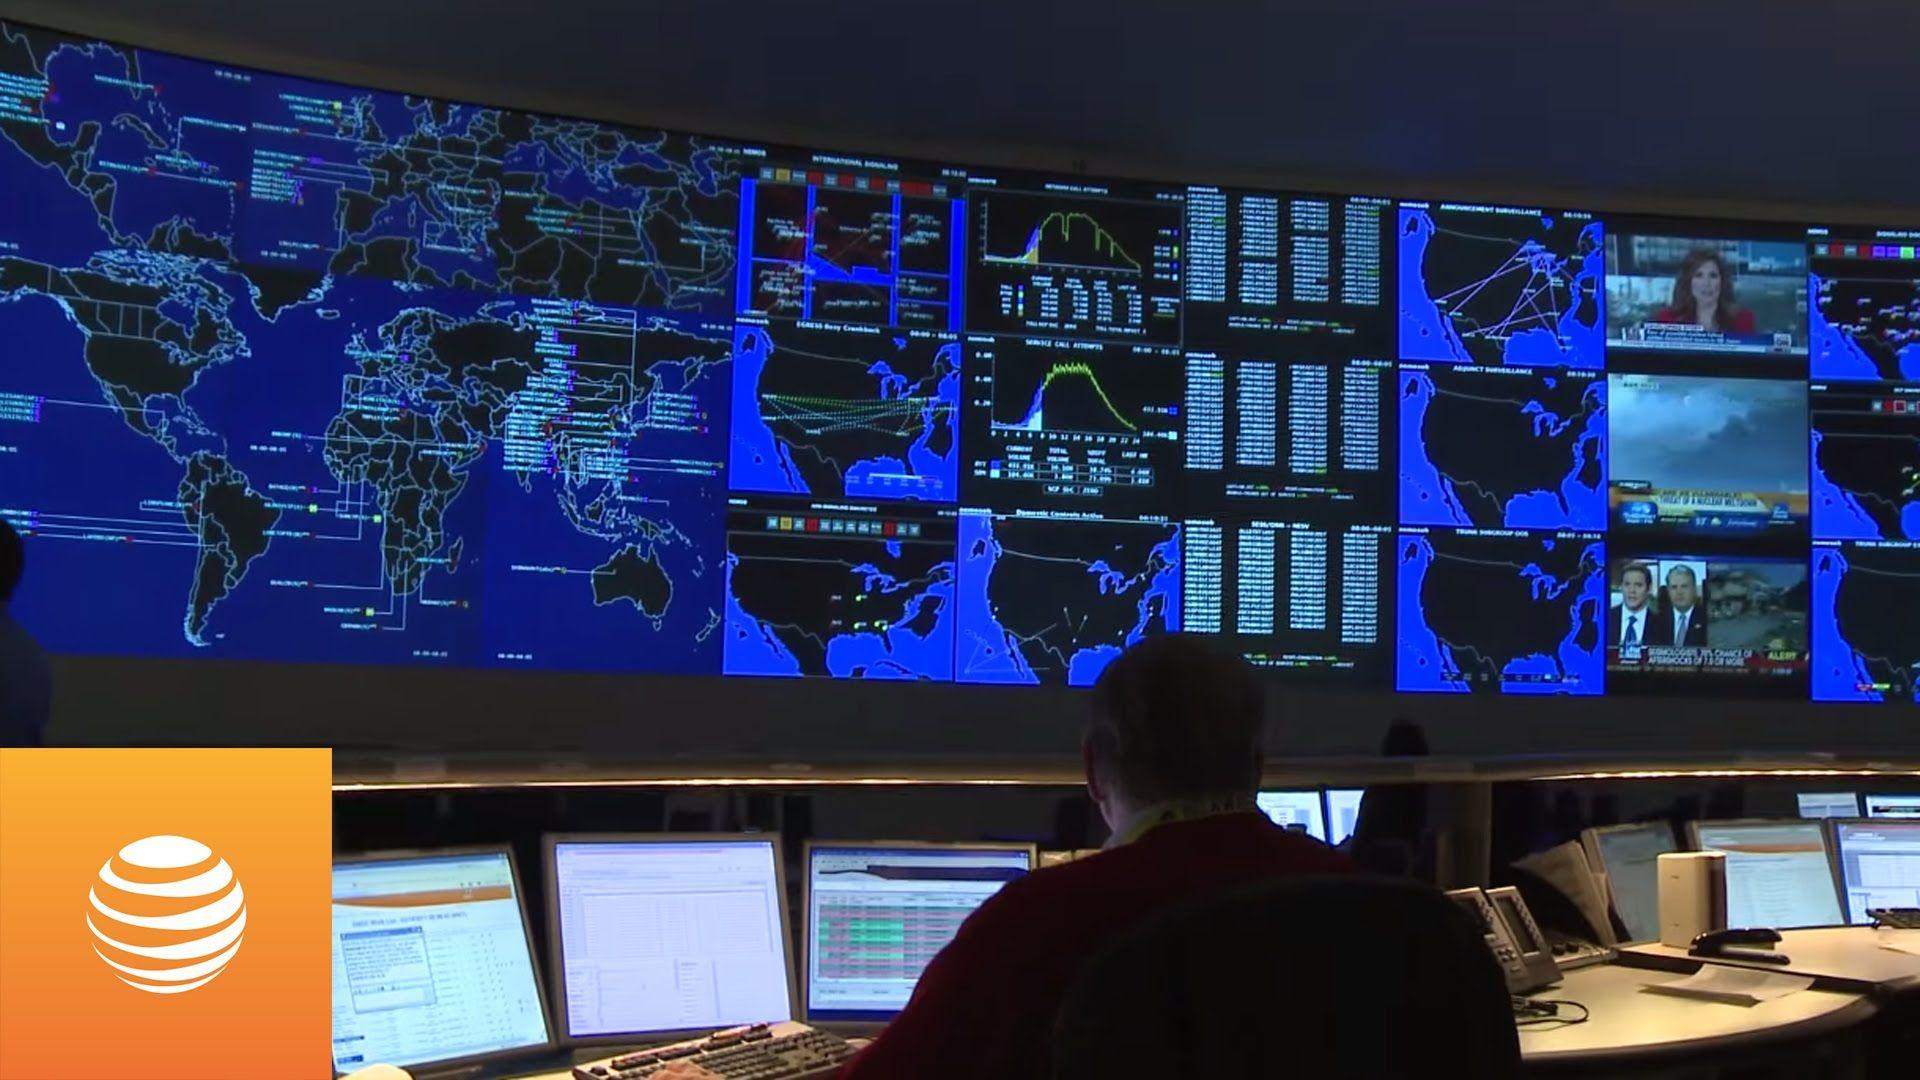 Att global network operations center